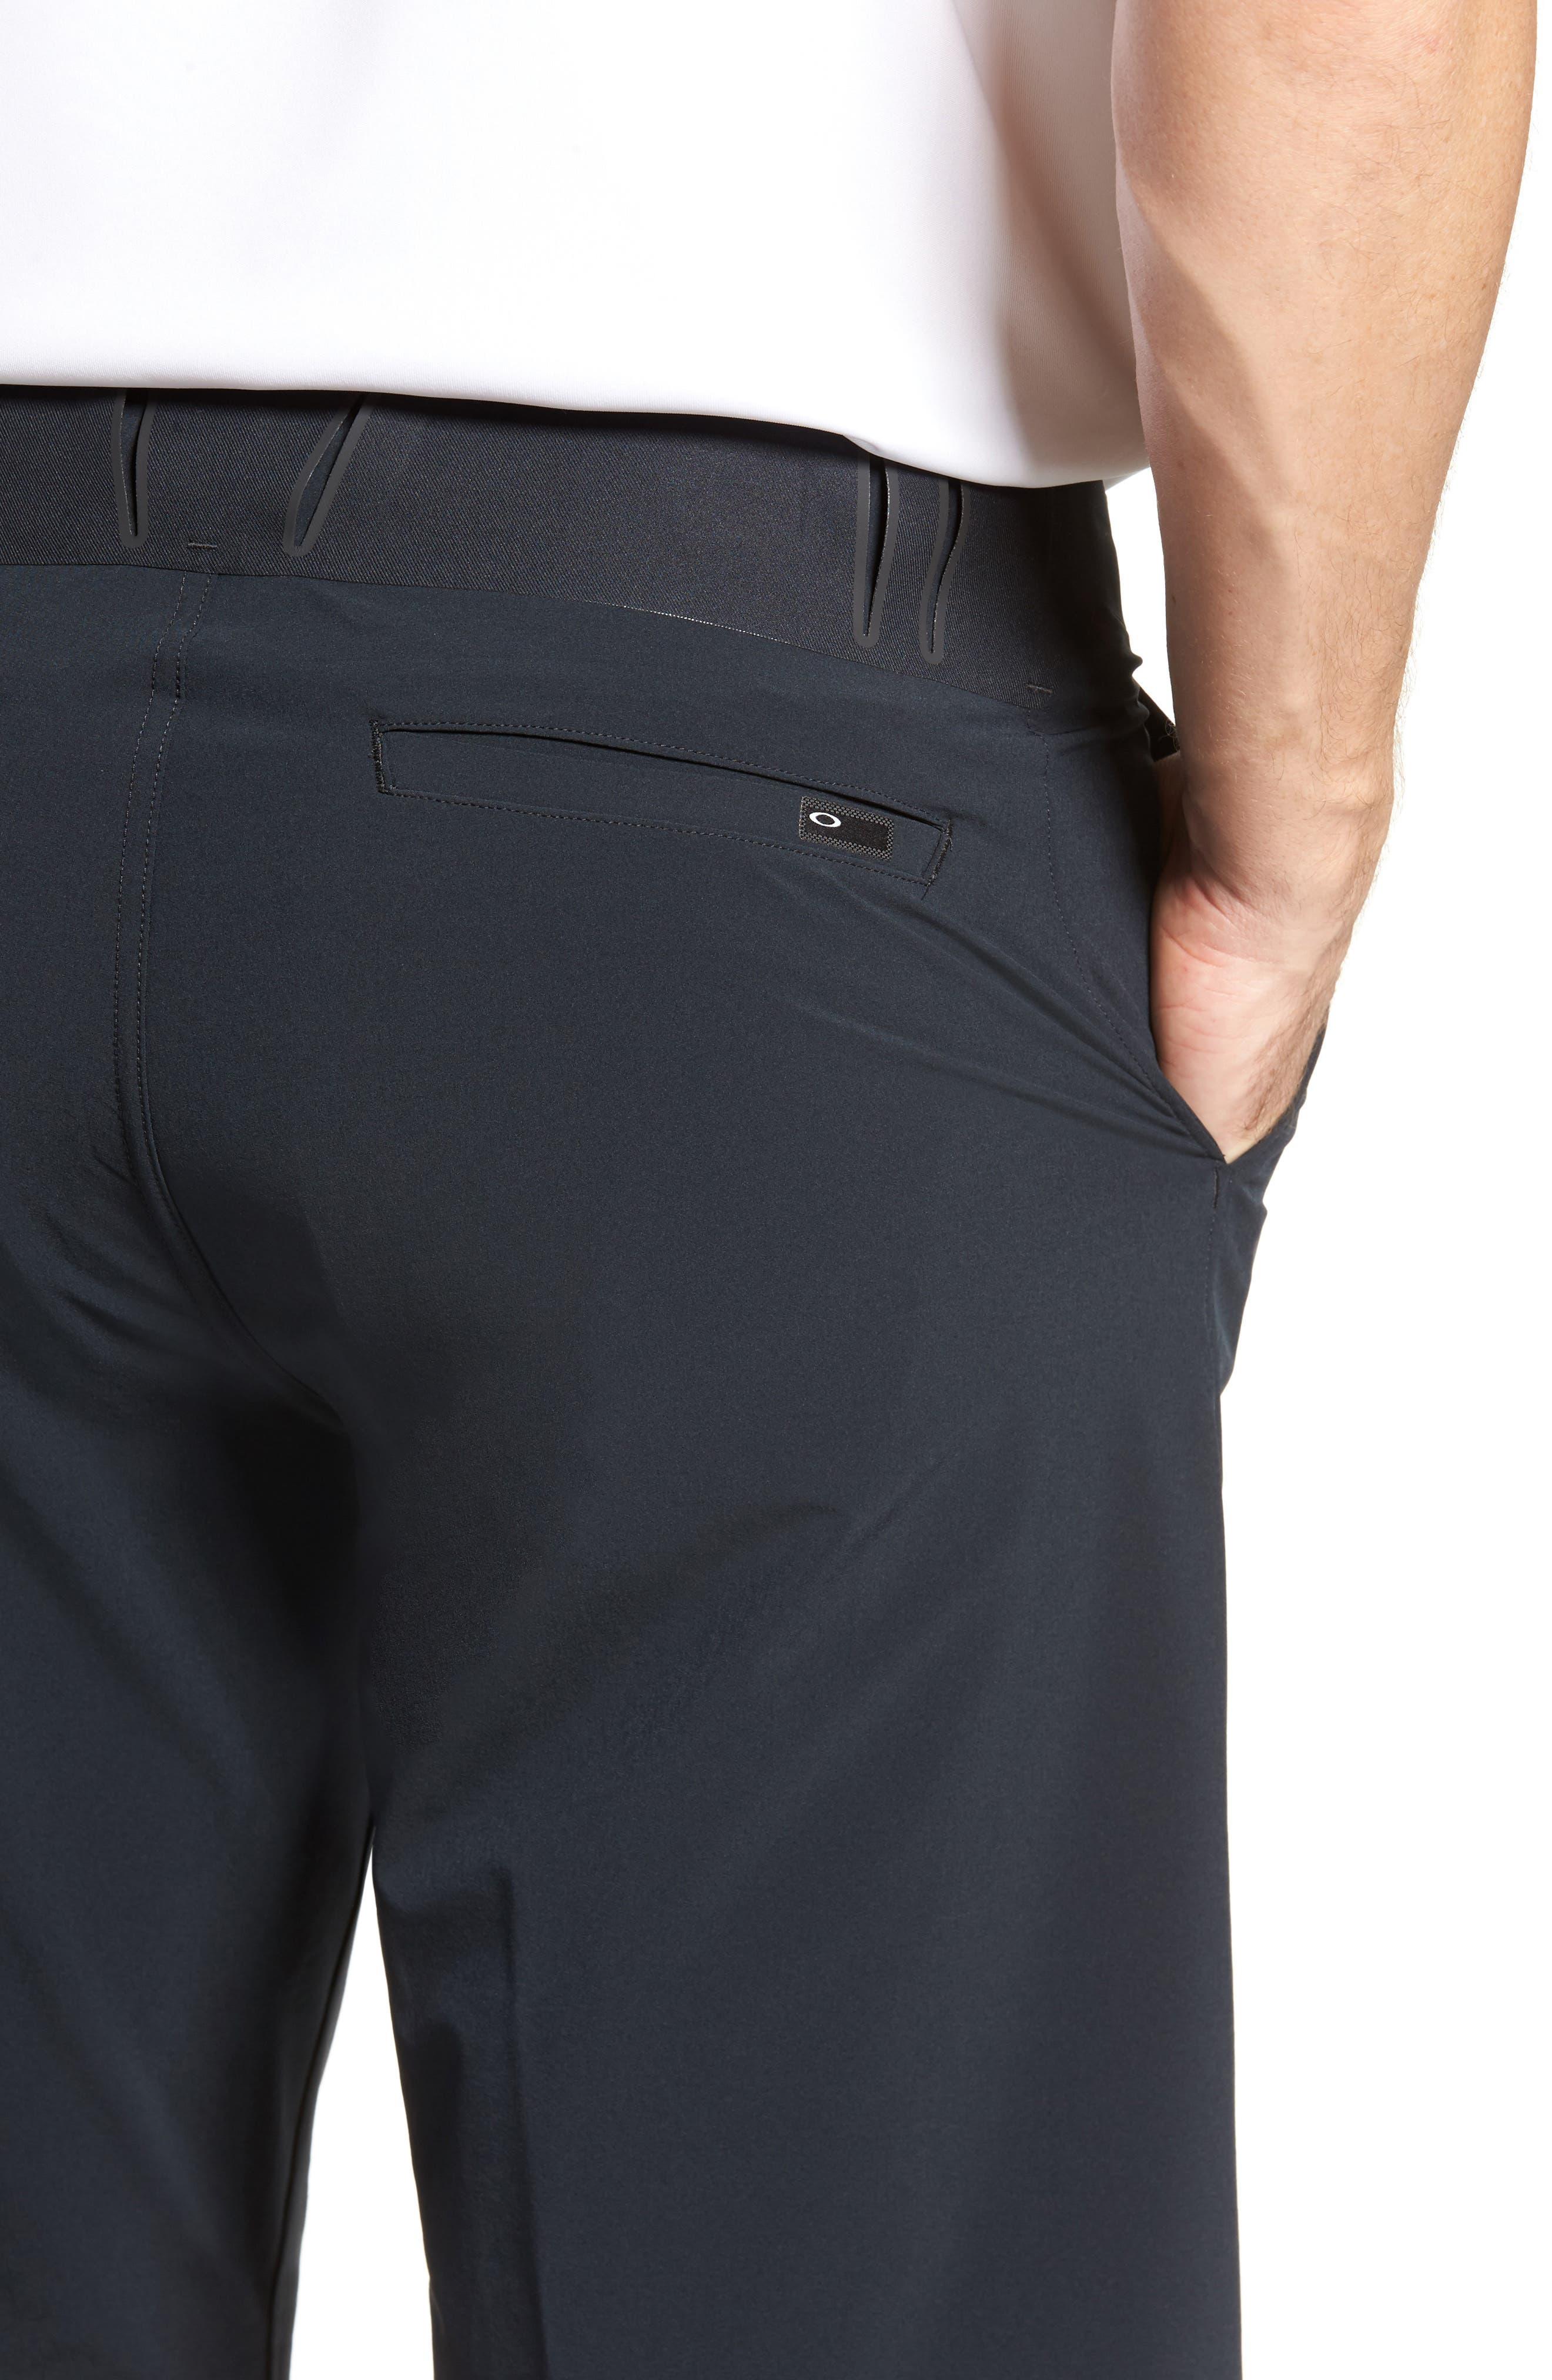 Velocity Shorts,                             Alternate thumbnail 4, color,                             001